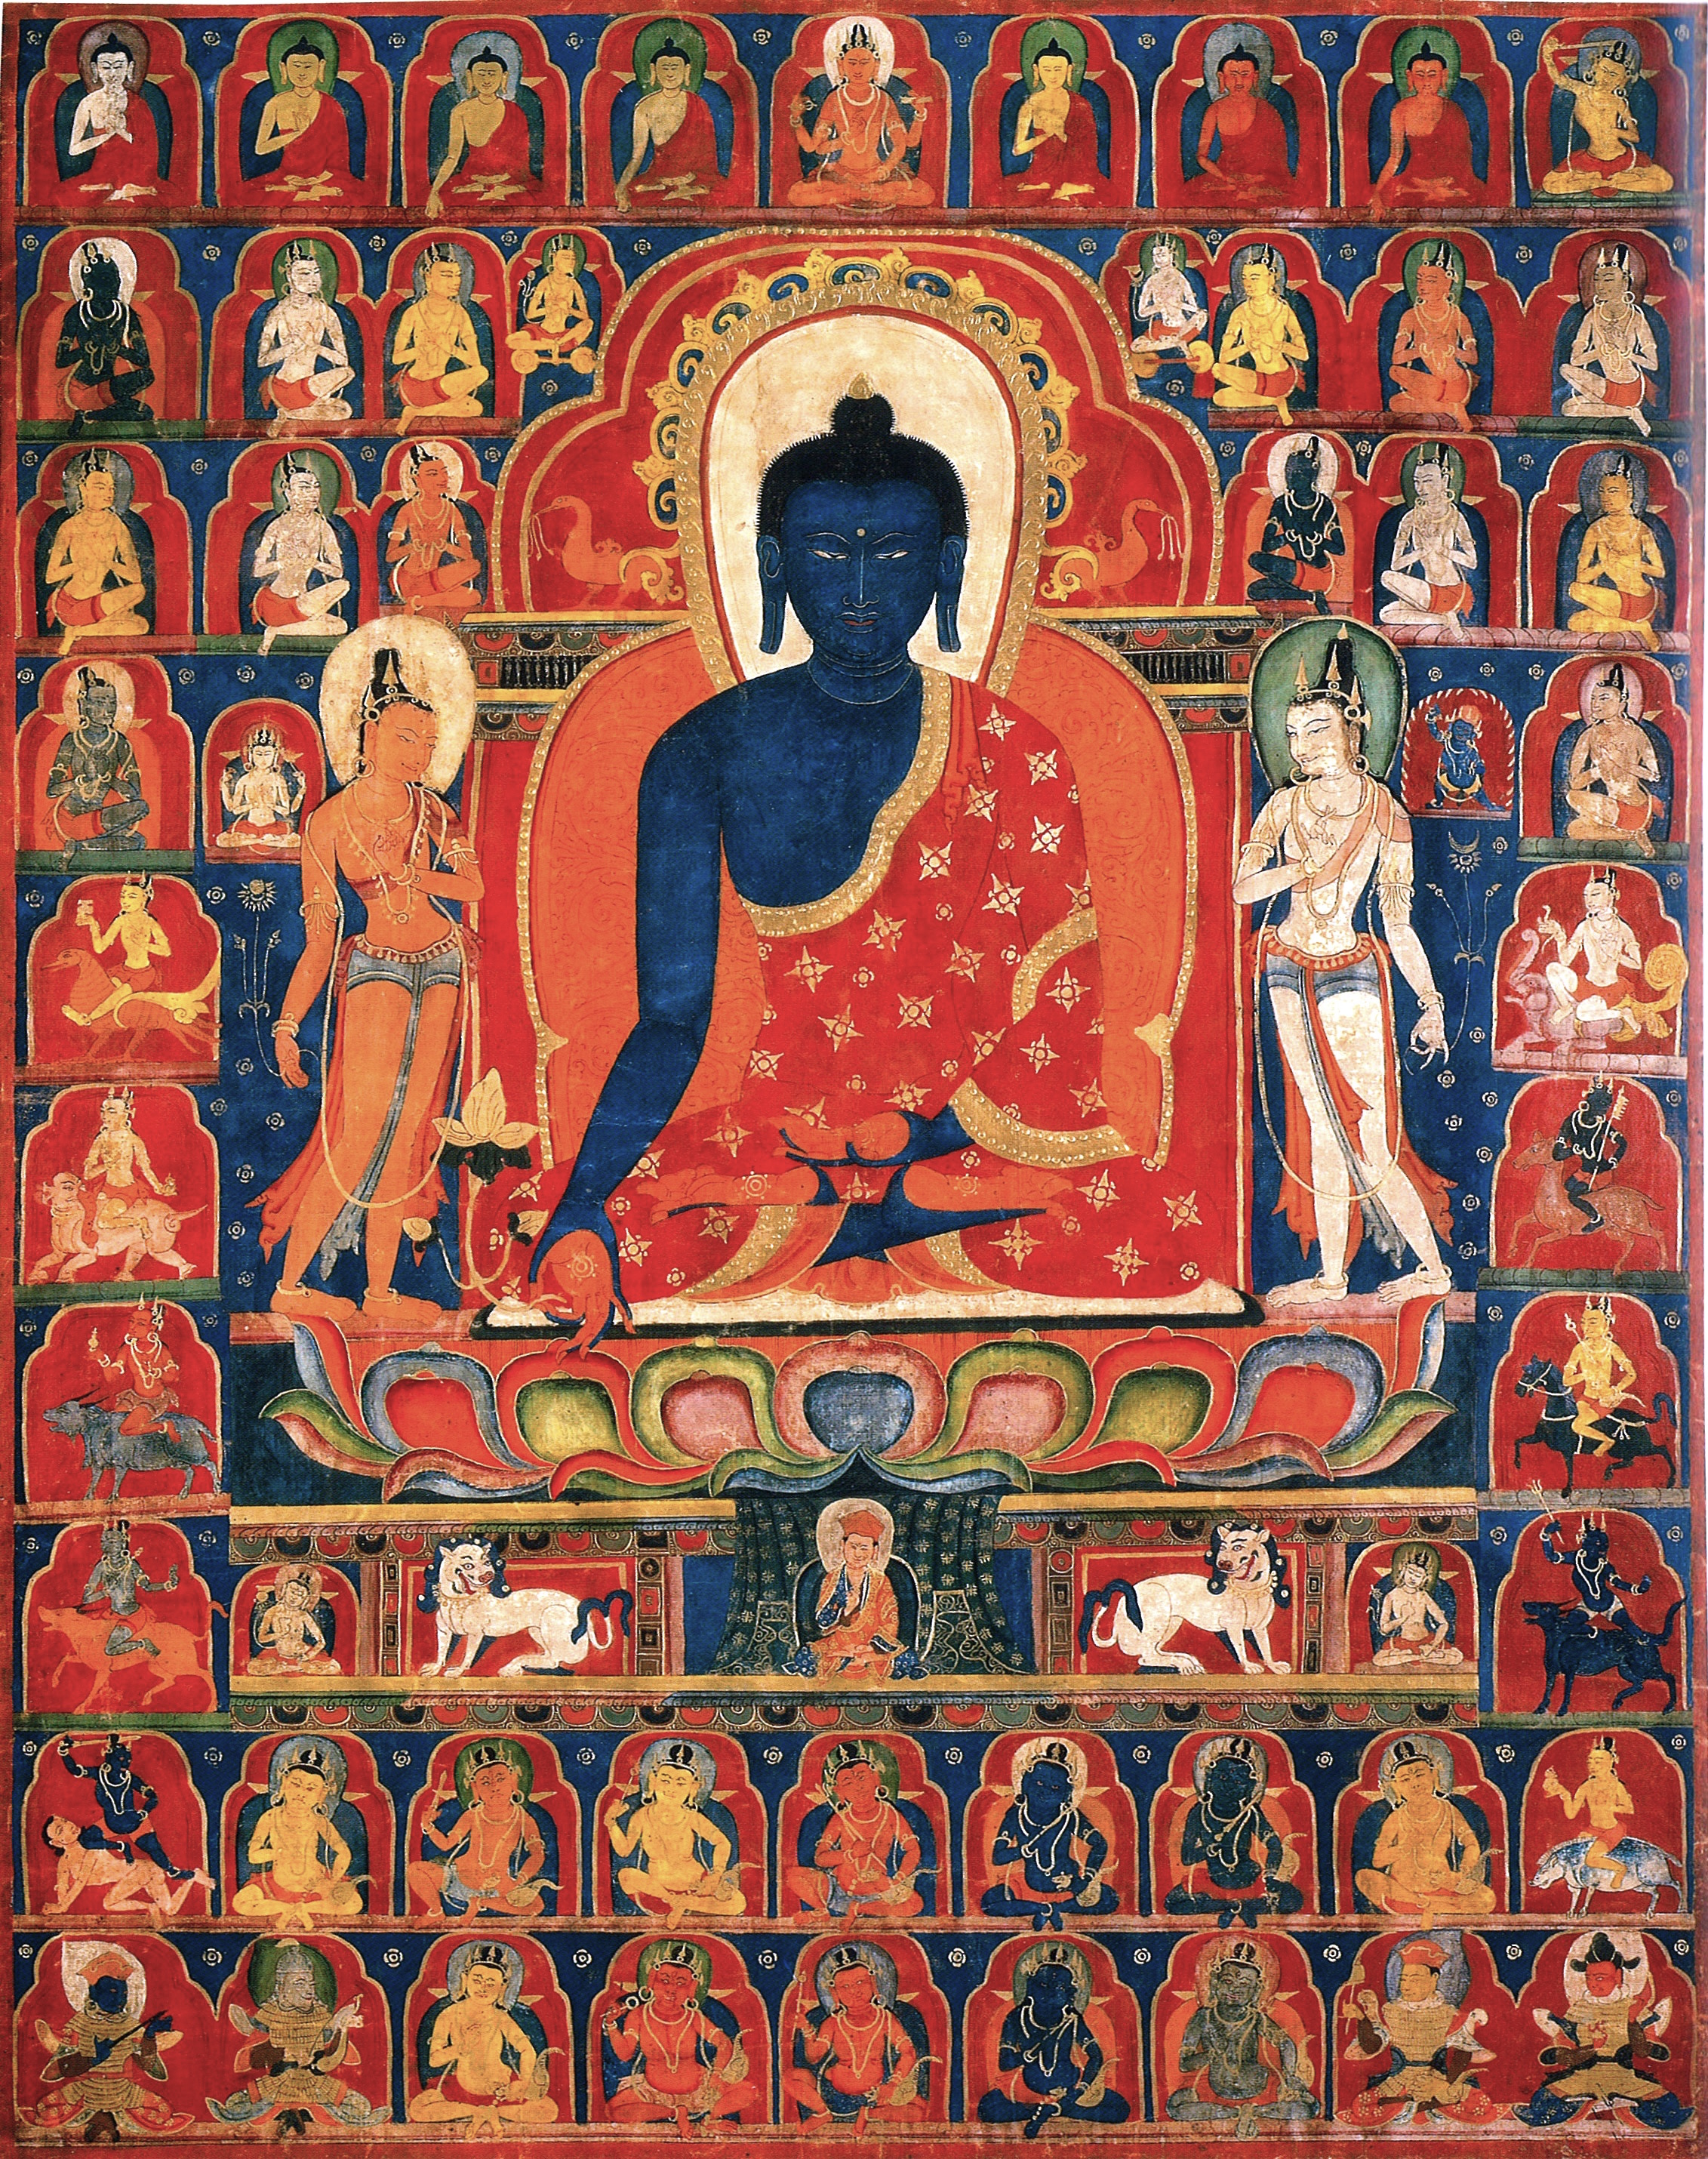 Tibetan Painted Banner of the Medicine Buddha